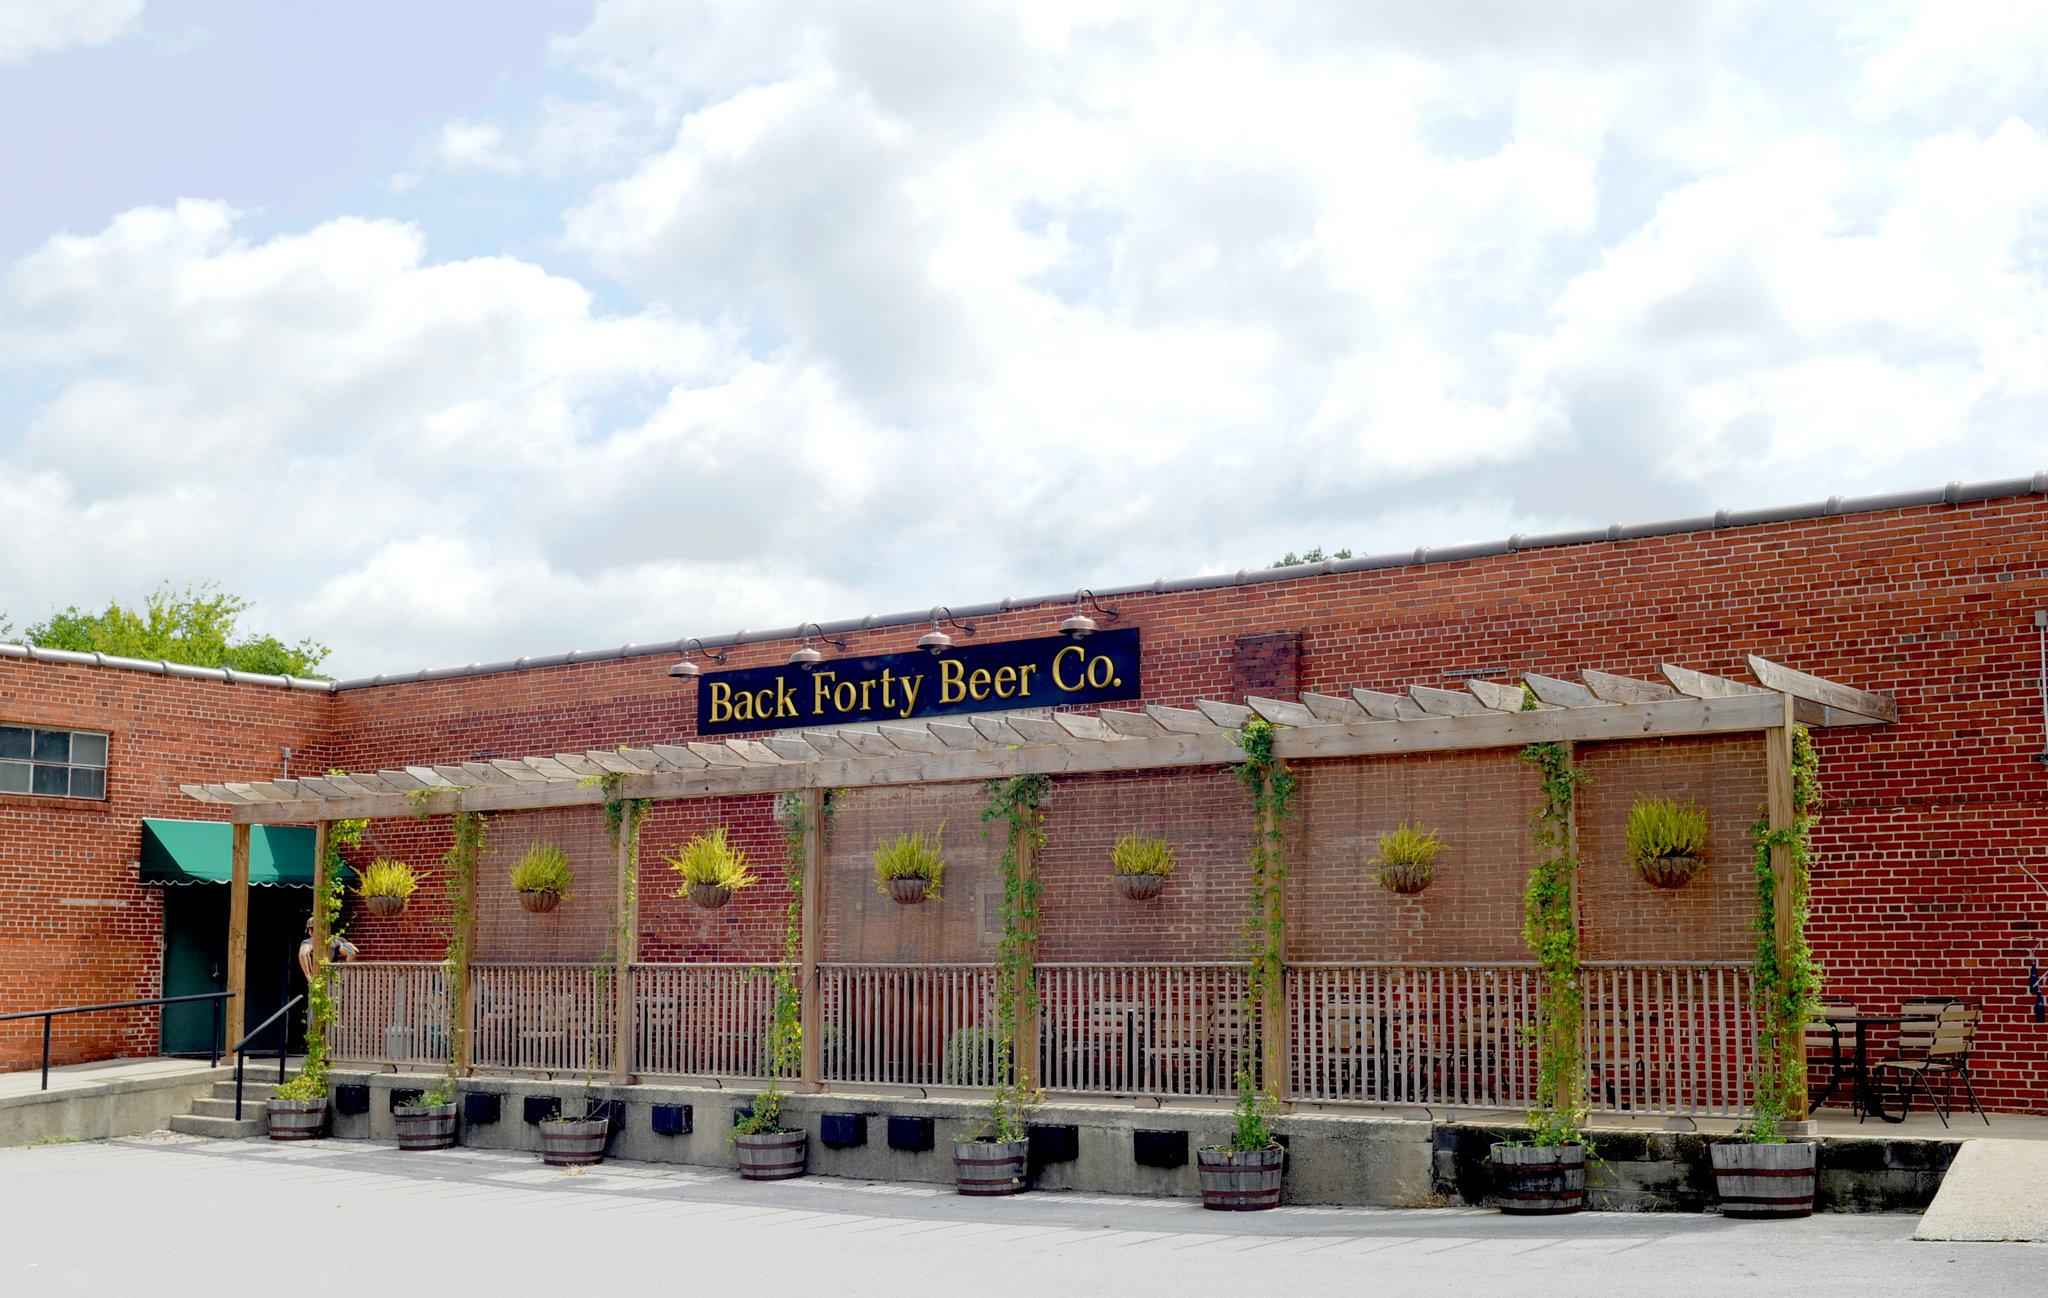 back-forty-beer-co-brewery-in-gadsdenjpg-b5441776686e65e1.jpg